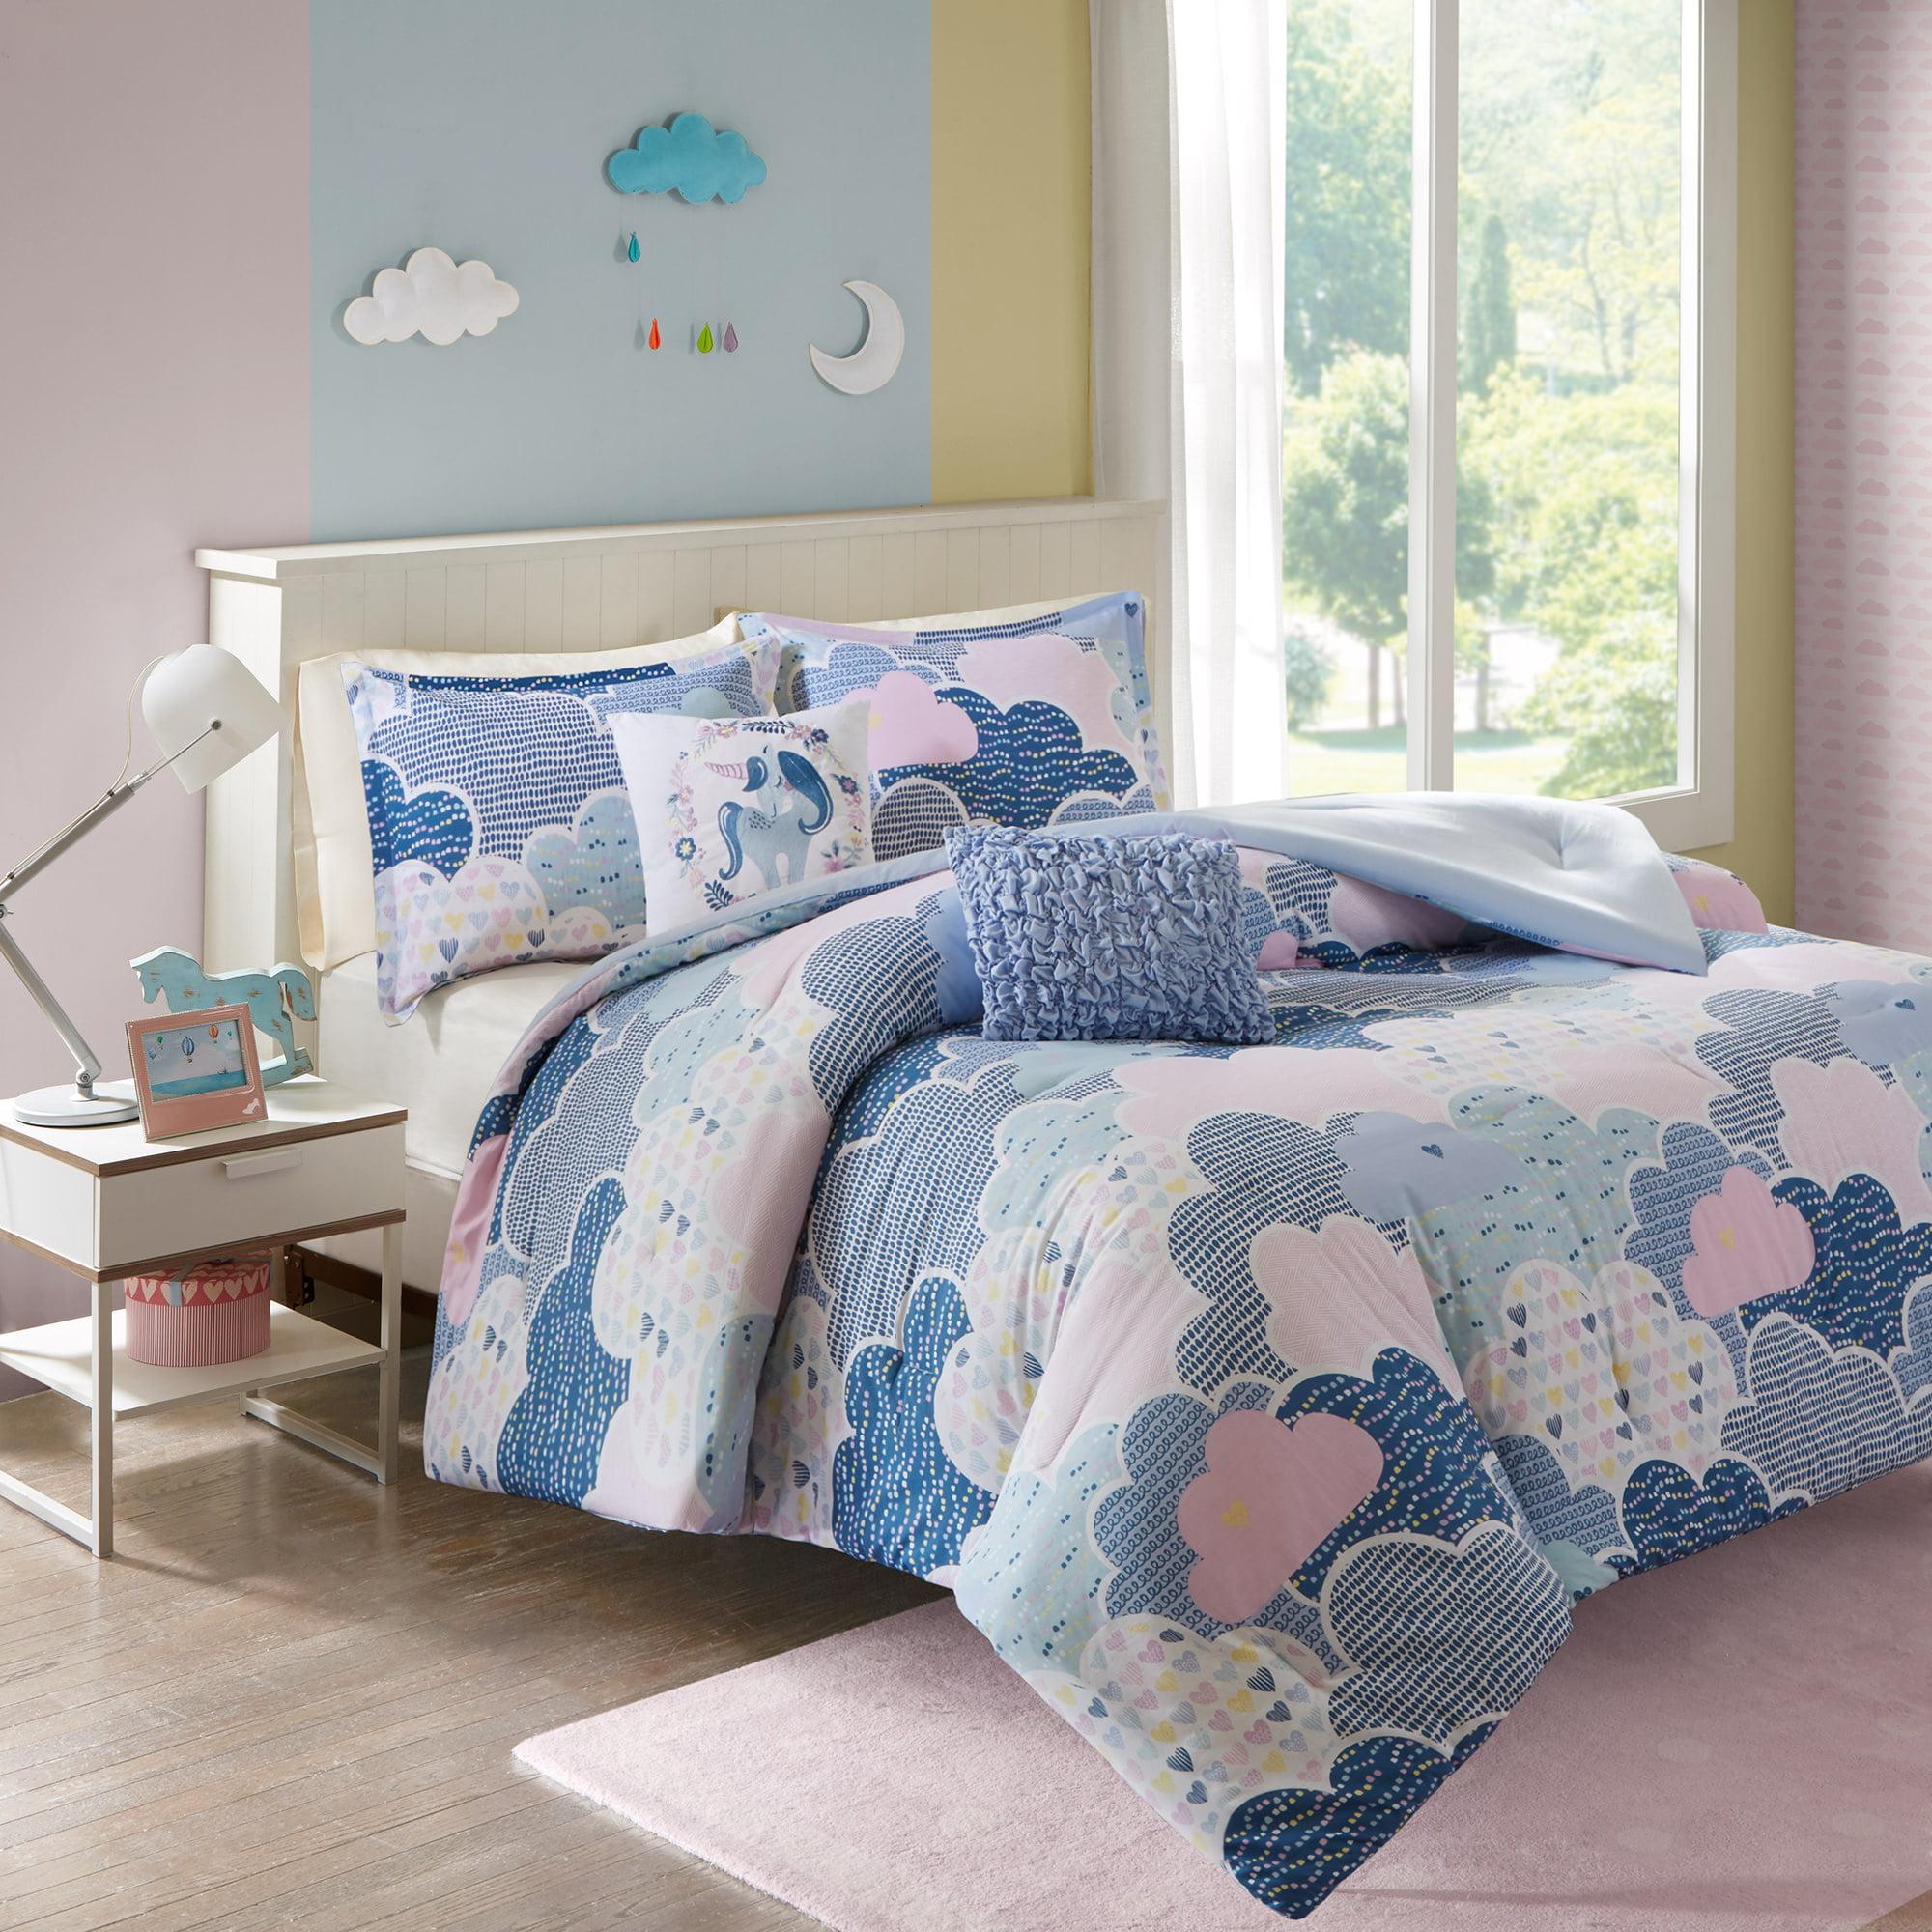 Home Essence Kids Euphoria Cloud Printed Cotton Comforter Bedding Set